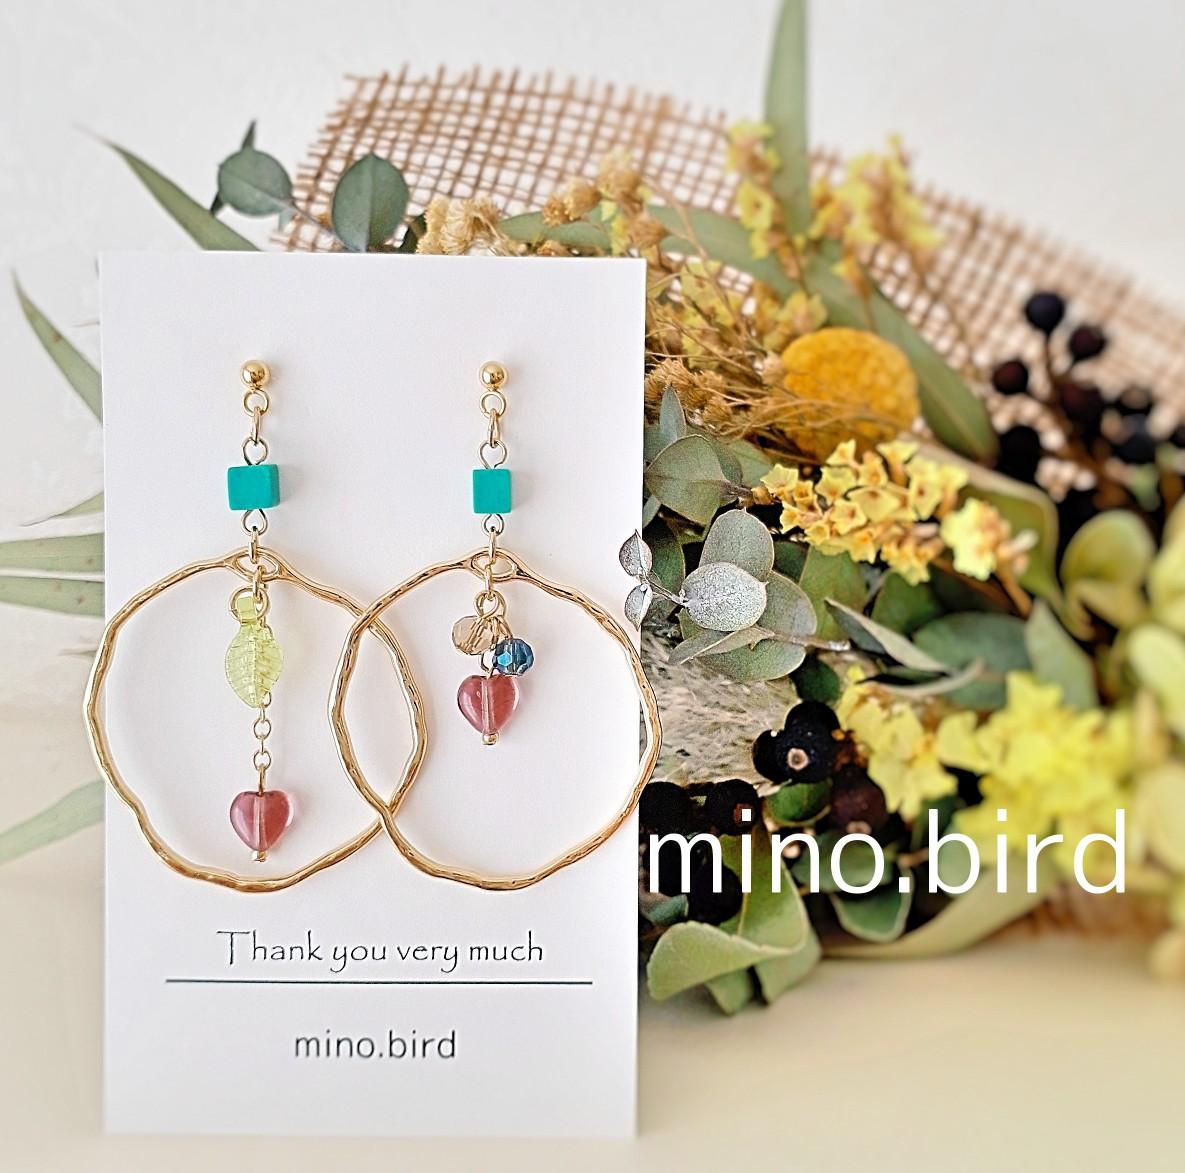 mino.bird